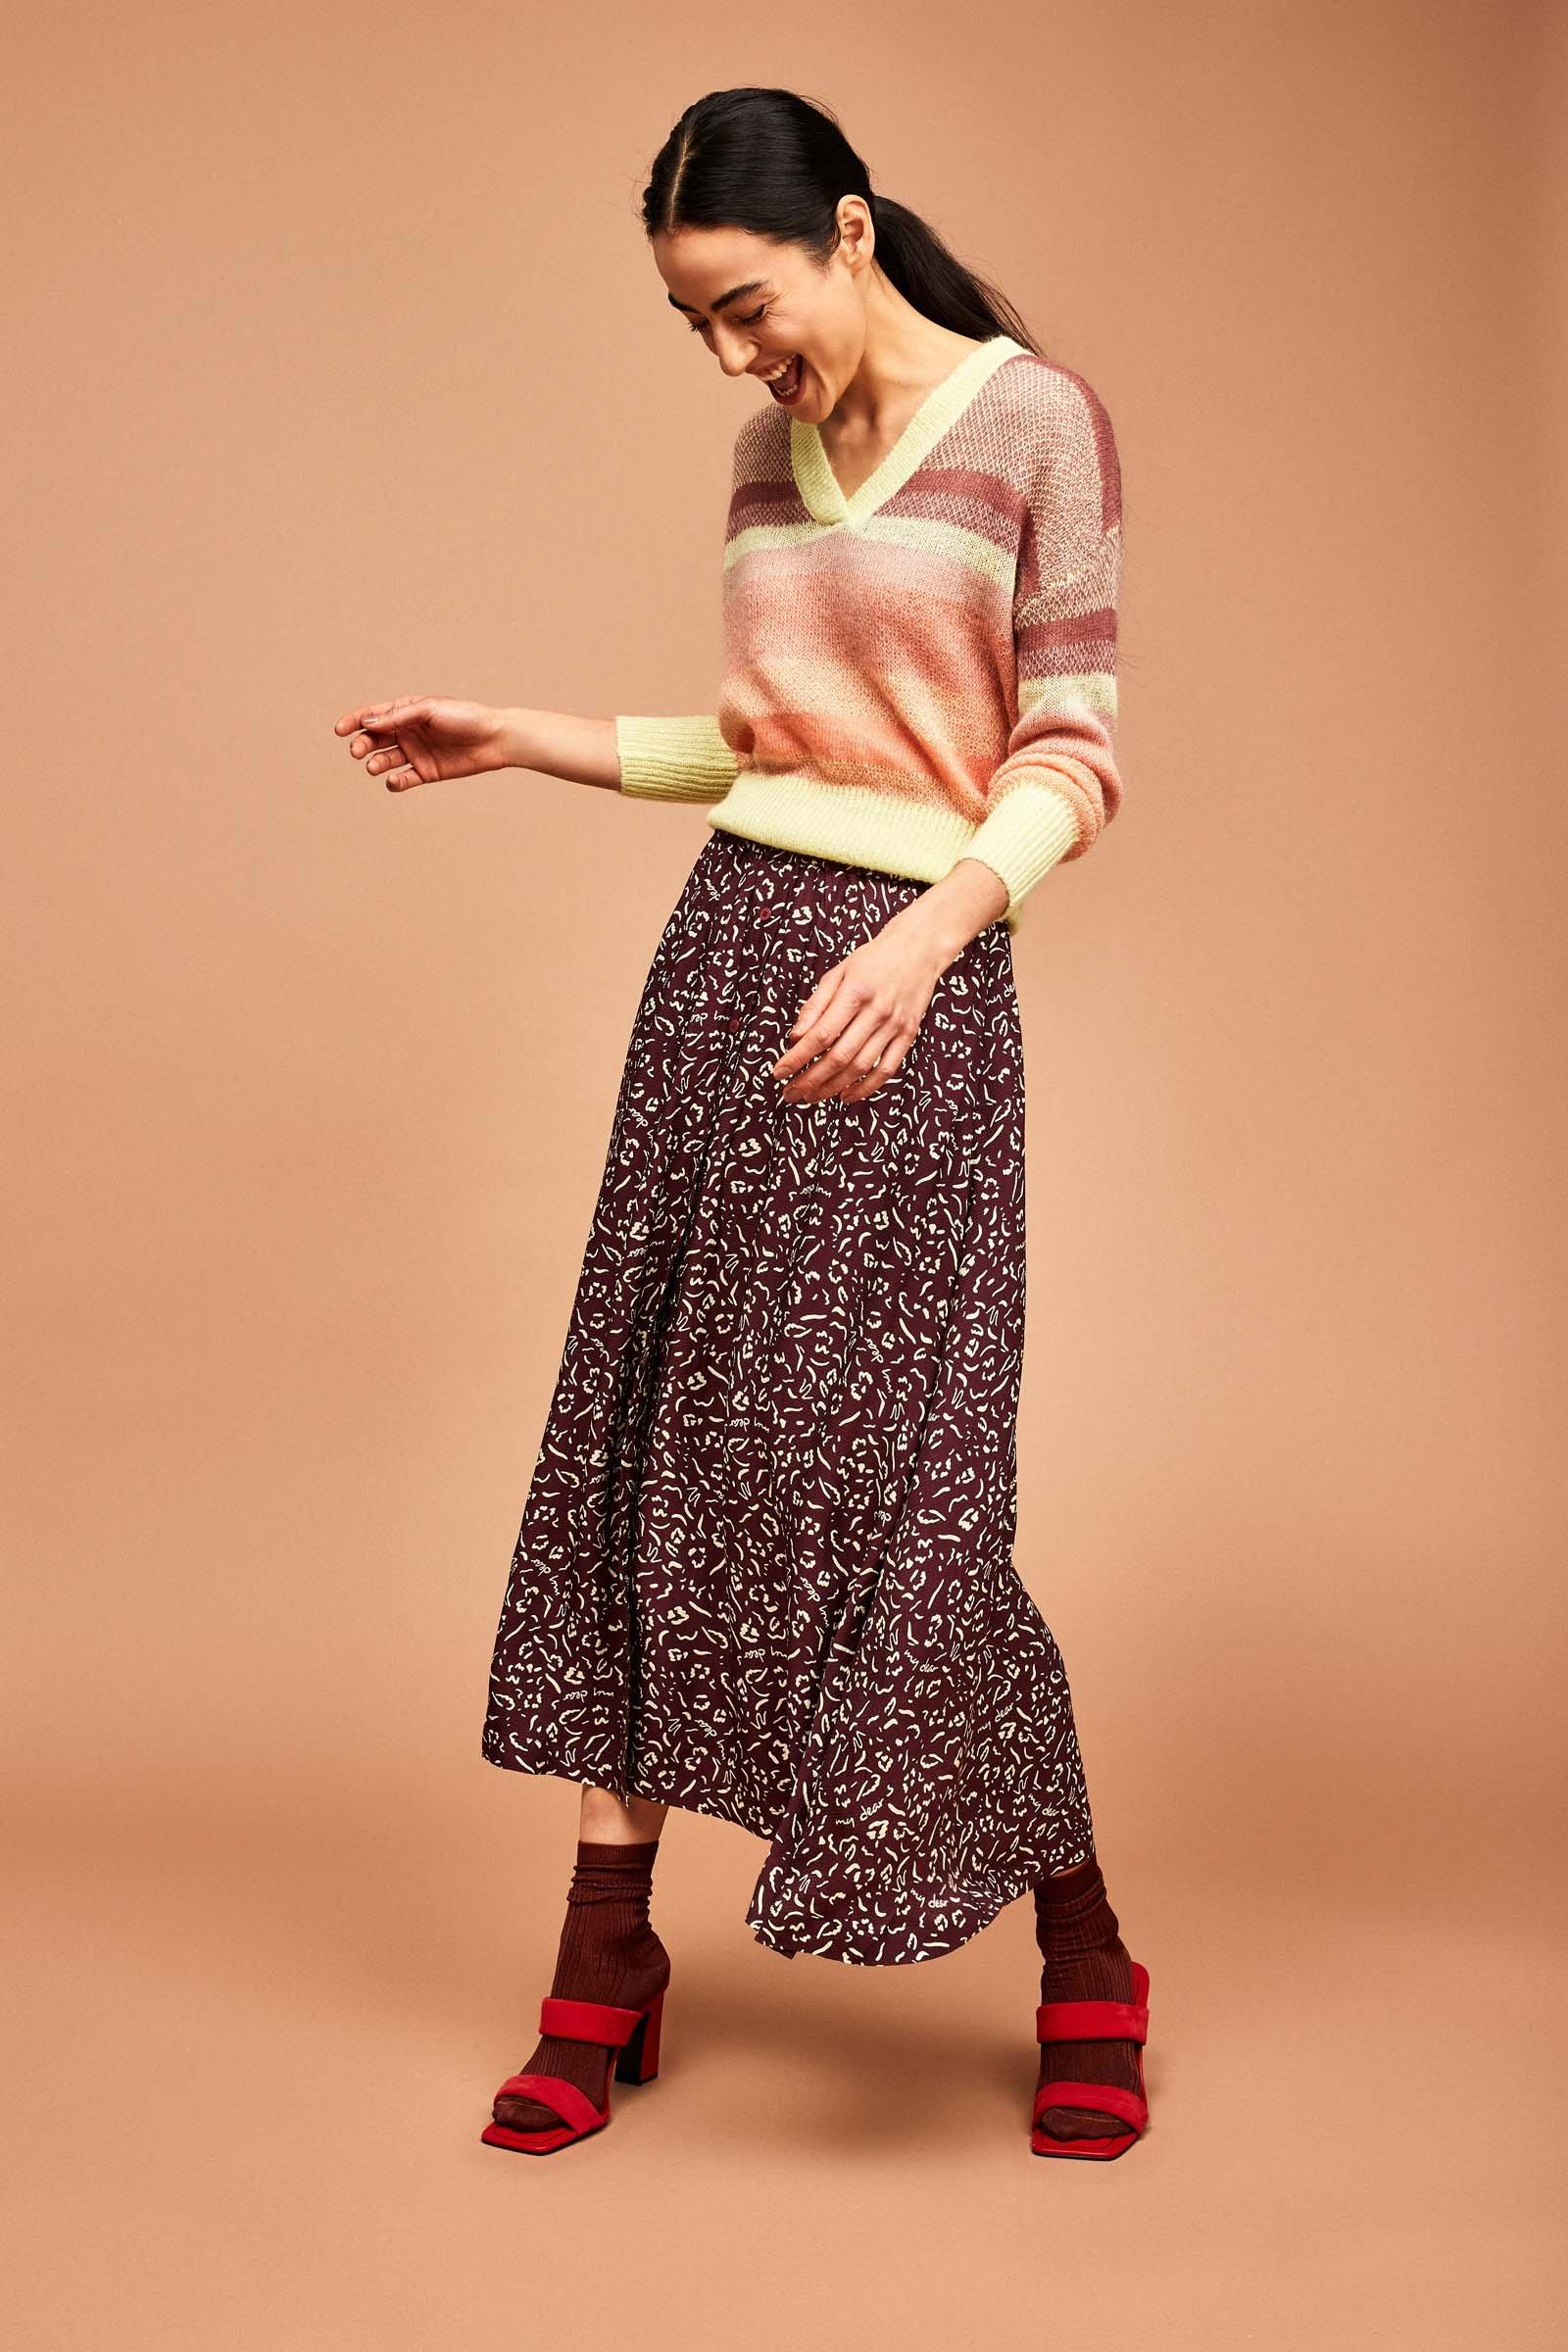 https://webmedia.cks-fashion.com/i/cks/123254ASM_10_l_model